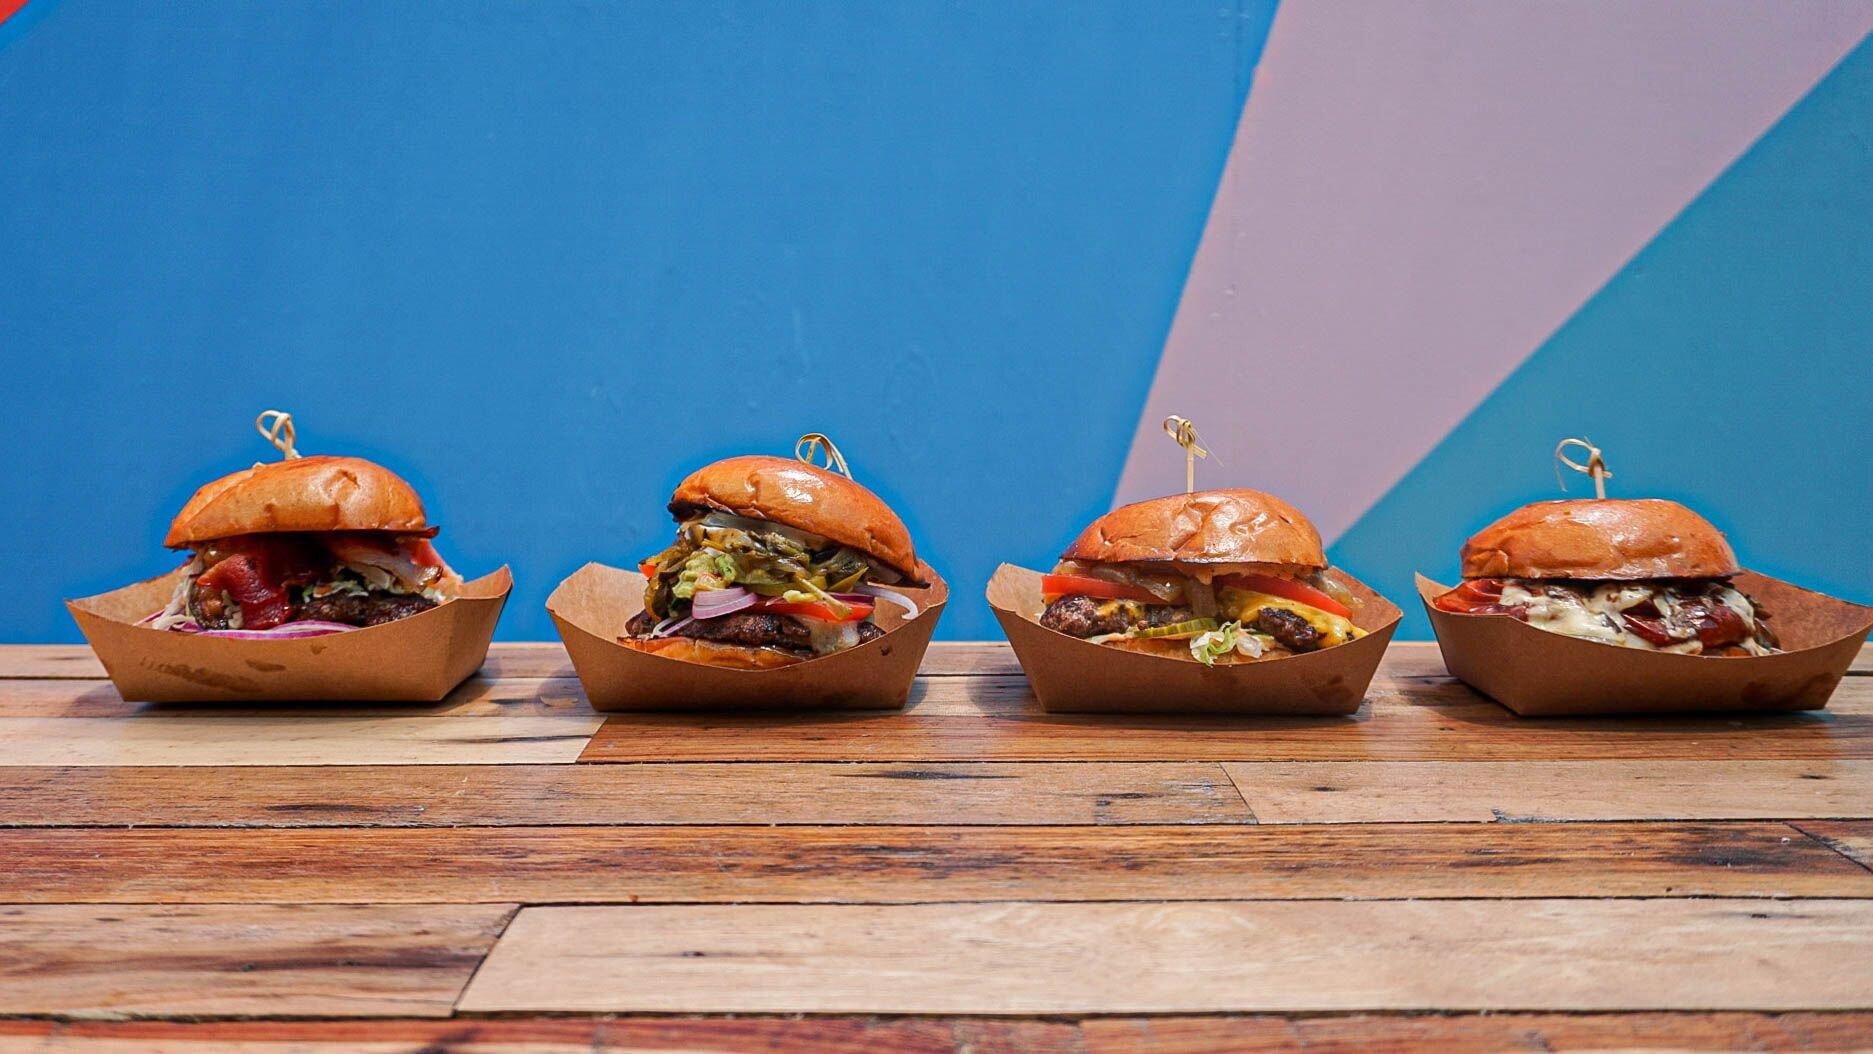 Celebrity Chef Brings Smörgasbord of Exquisite Burgers to Irvine